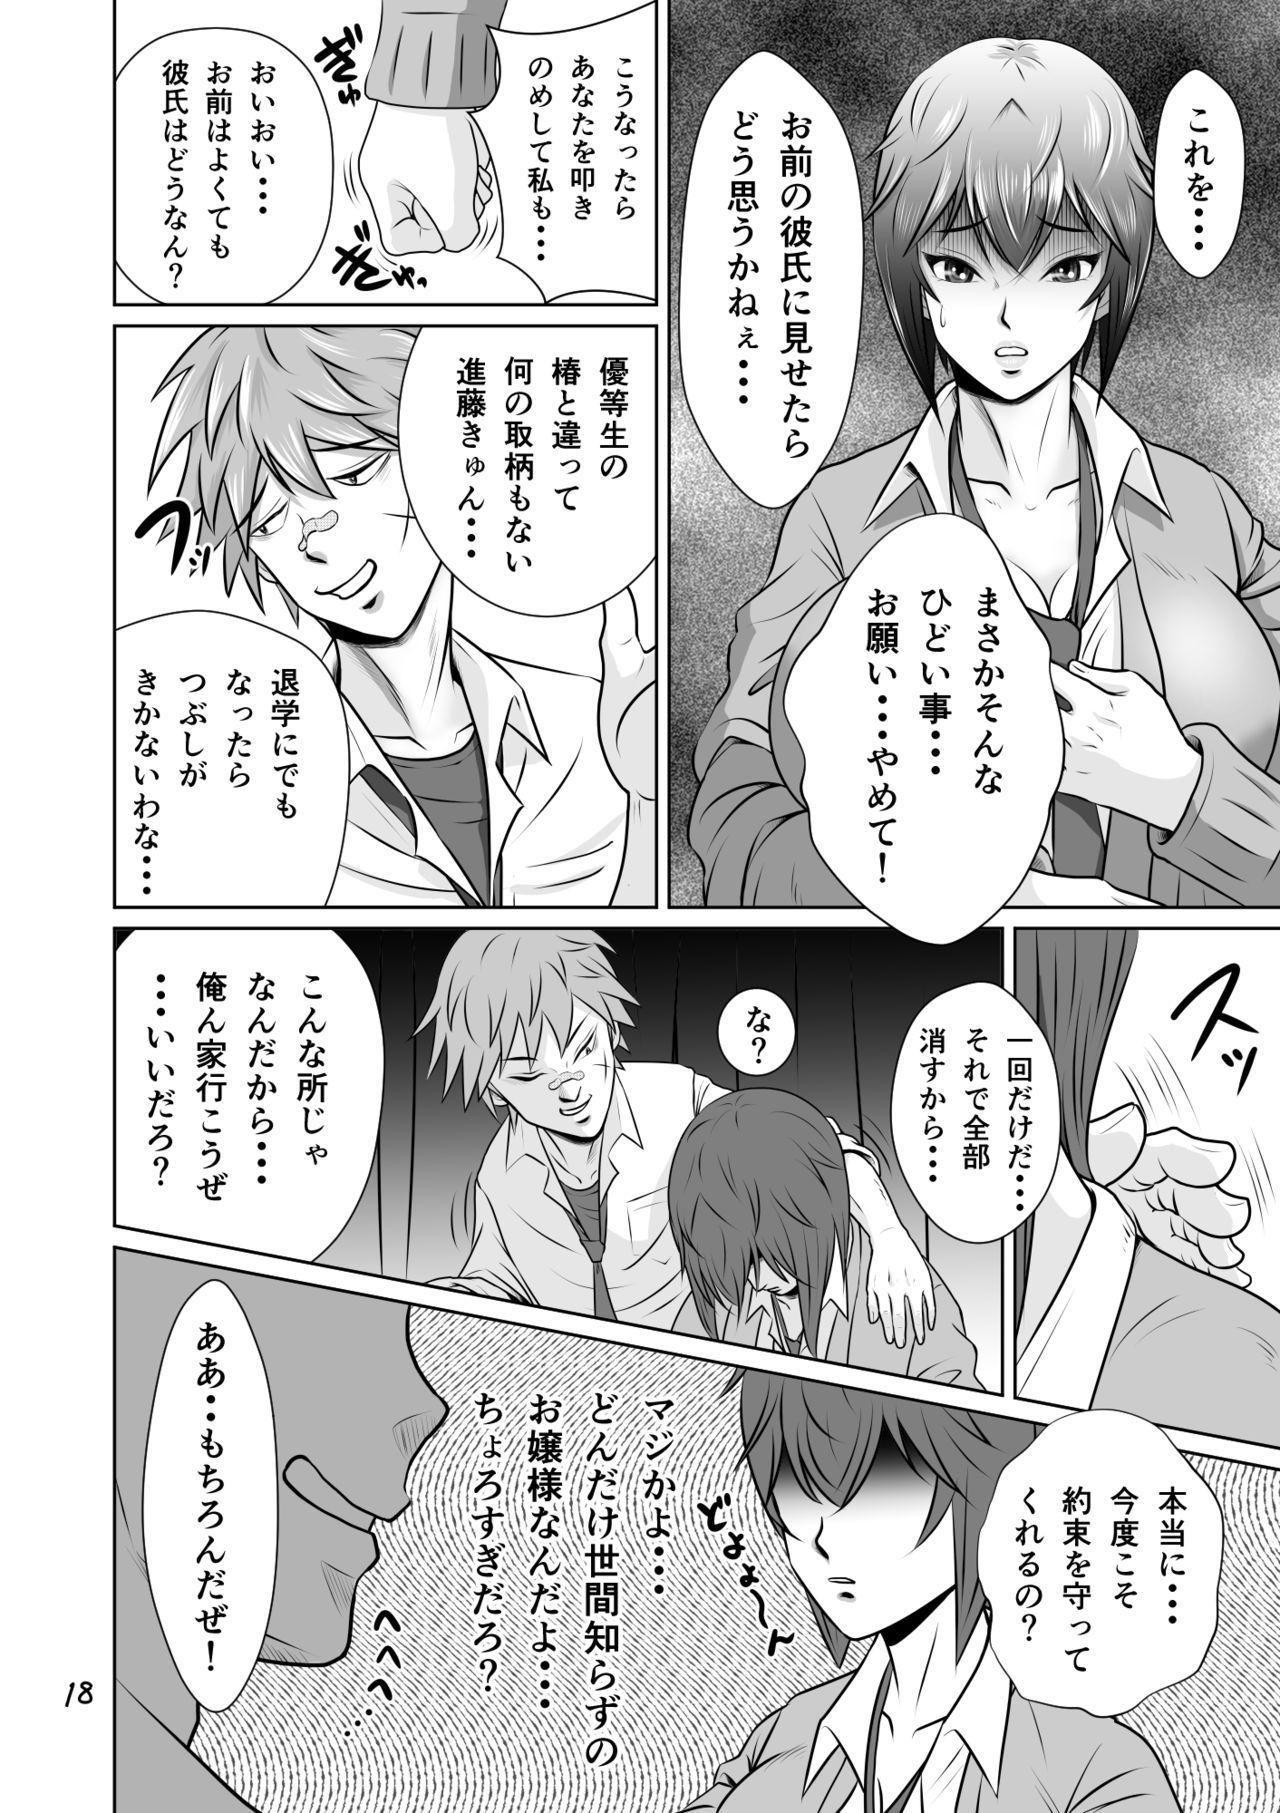 Netorare Osananajimi Haruka-chan Kiki Ippatsu!! 18